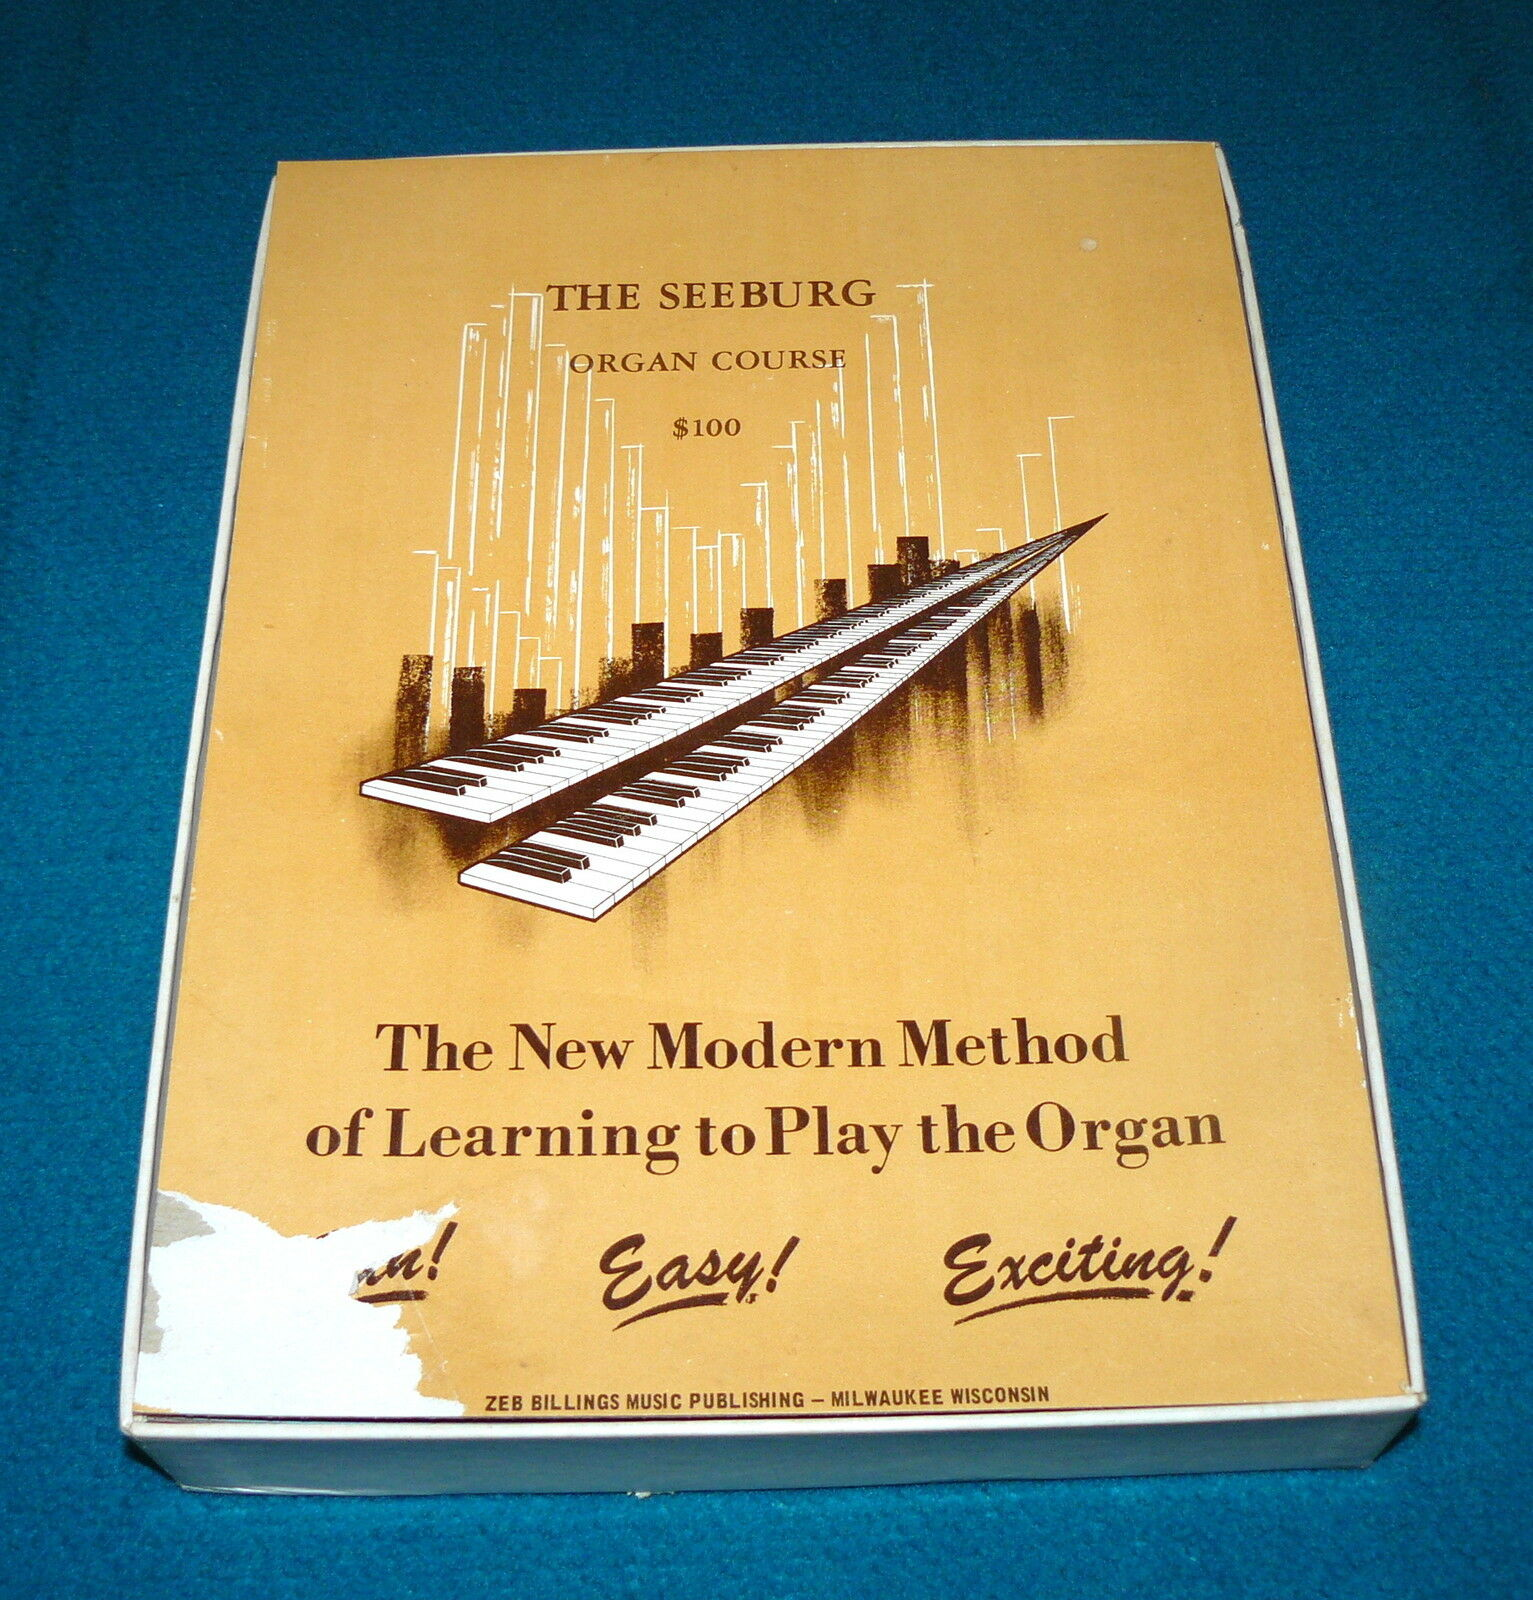 Vintage : SEEBURG Organ Course 97 of 112 Pieces SHEET MUSIC @ Zeb Billings 1964